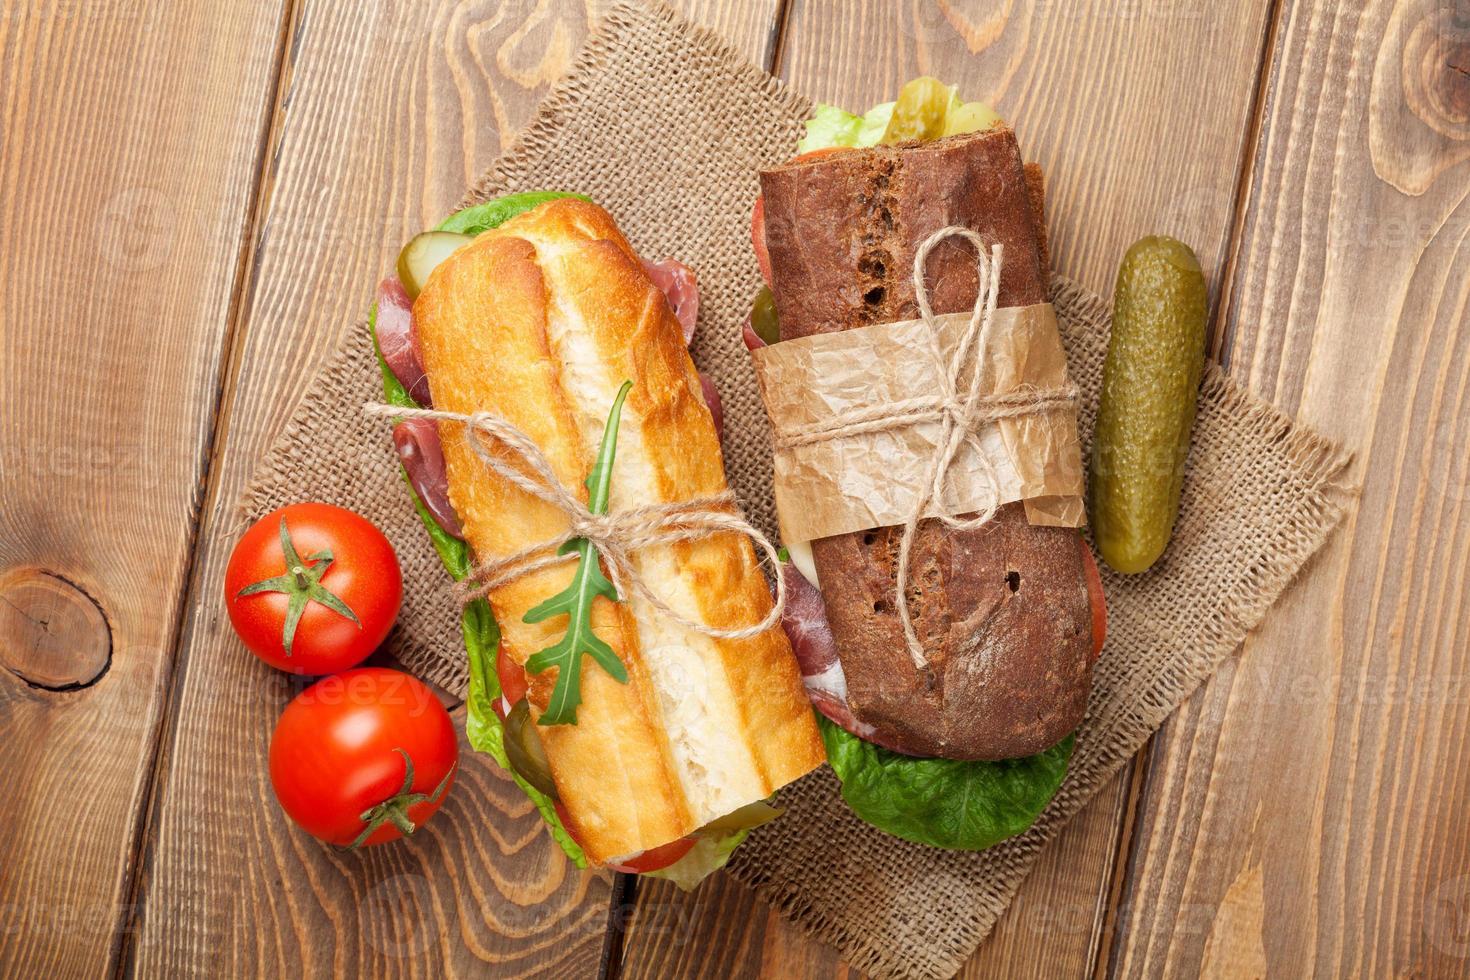 deux sandwichs avec salade, jambon, fromage photo